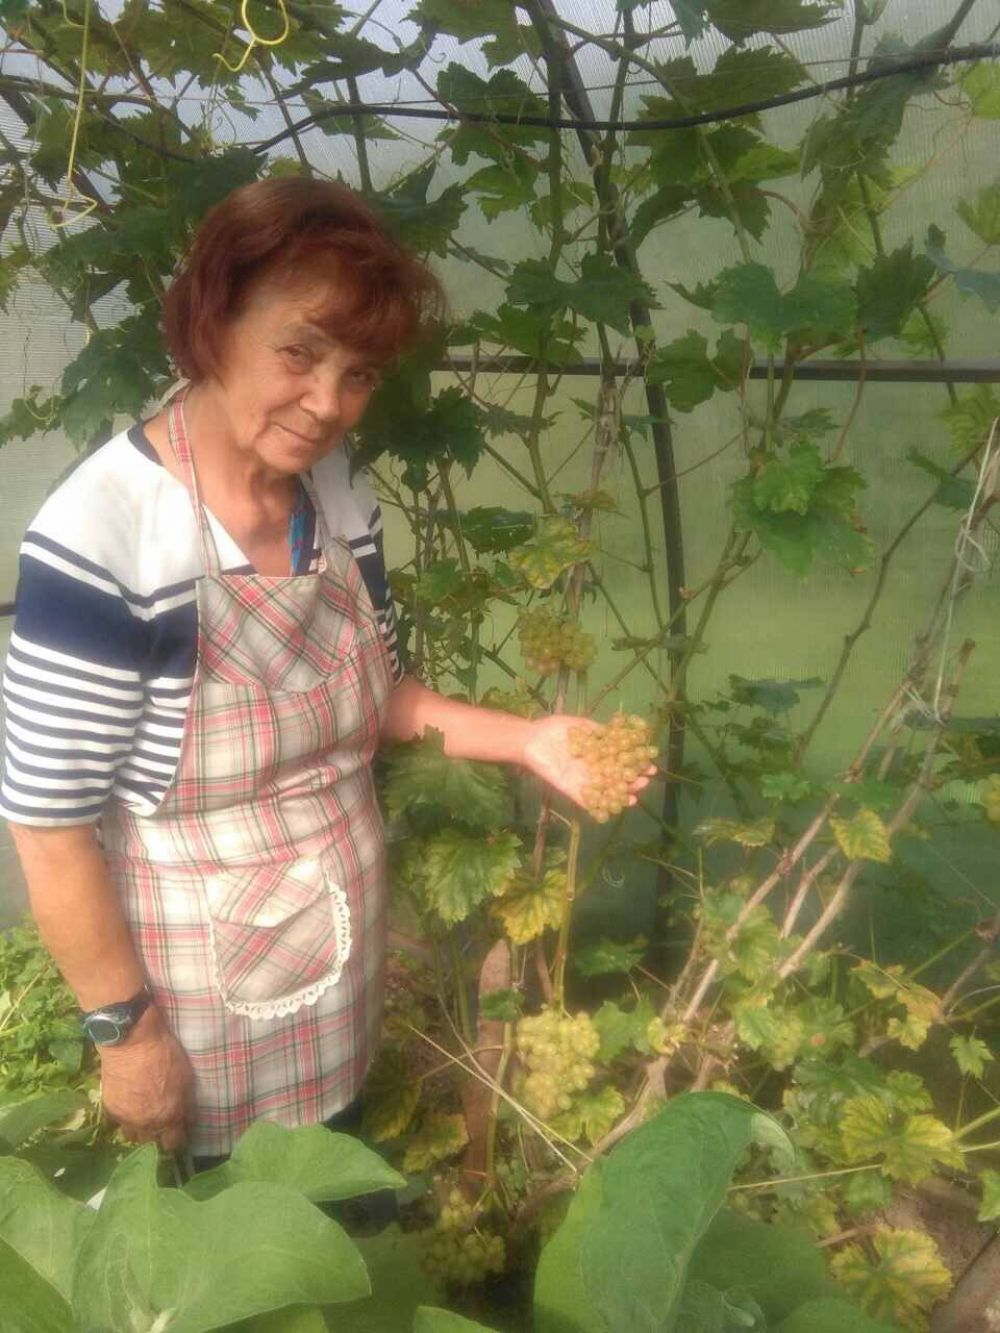 Участник № 25. Любовь Смолякова: «Что нам дождь, что нам град - зреет, зреет виноград».